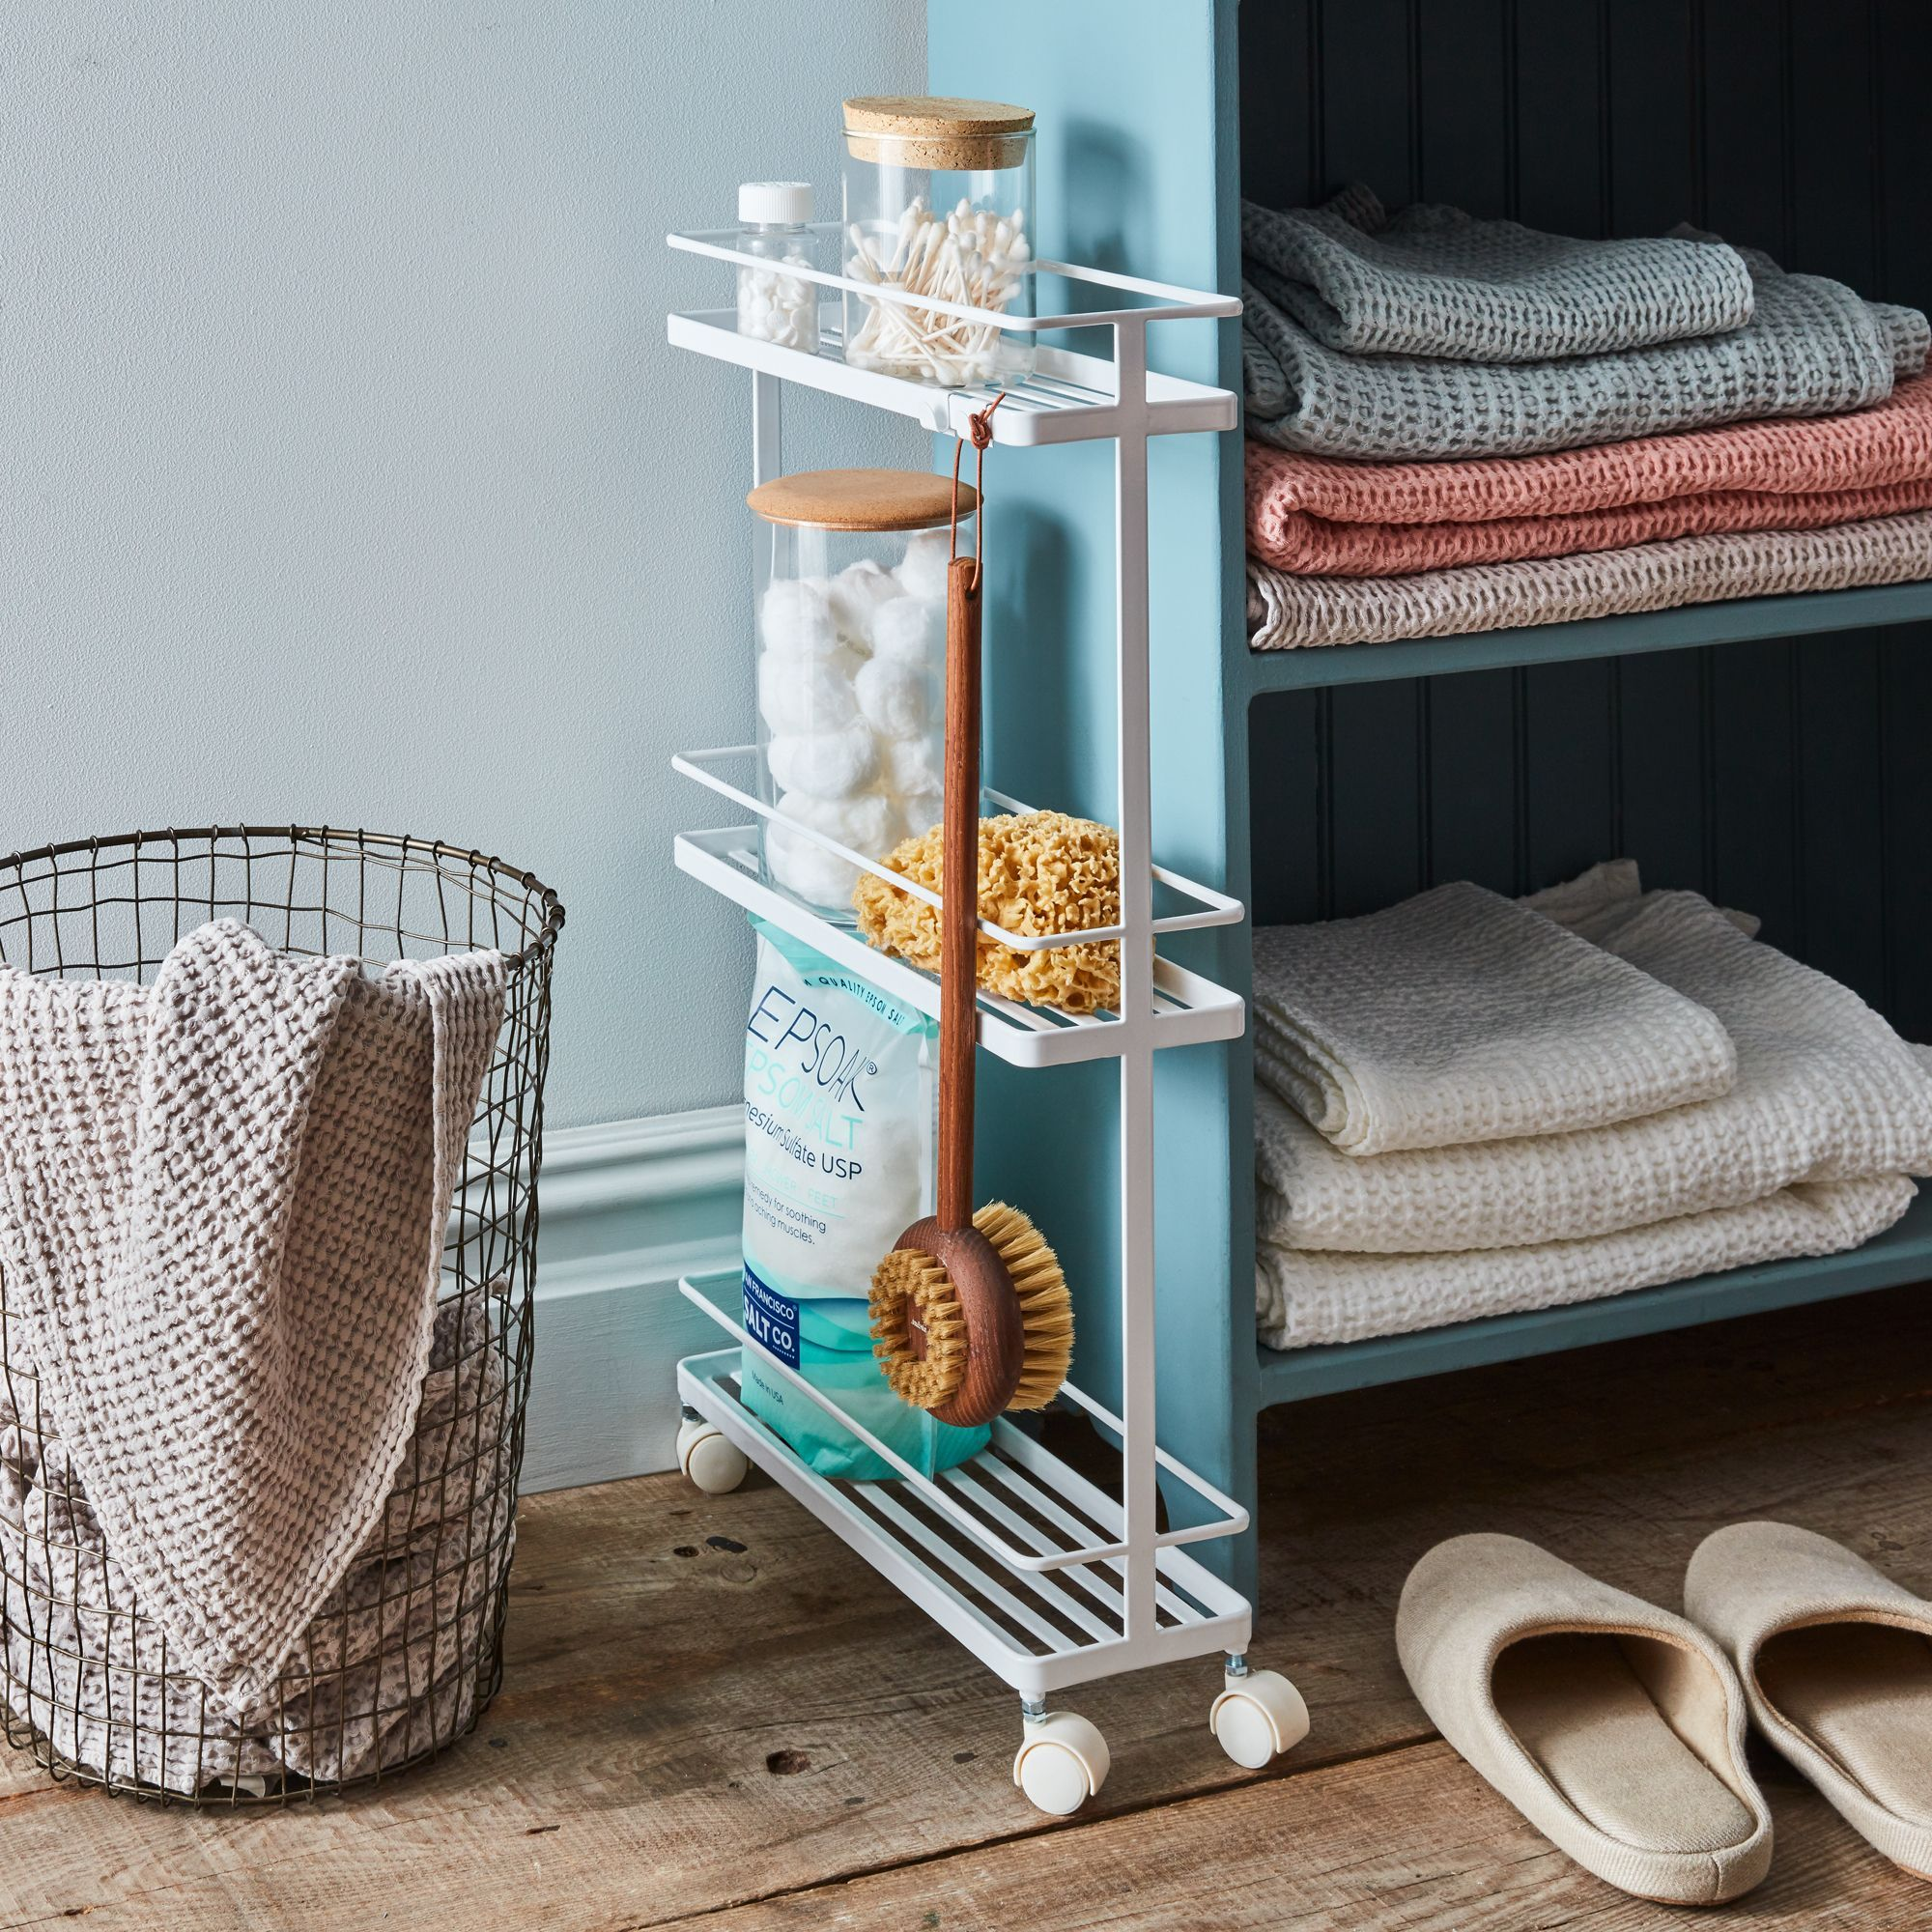 21 Bathroom Storage And Organization Ideas How To Organize